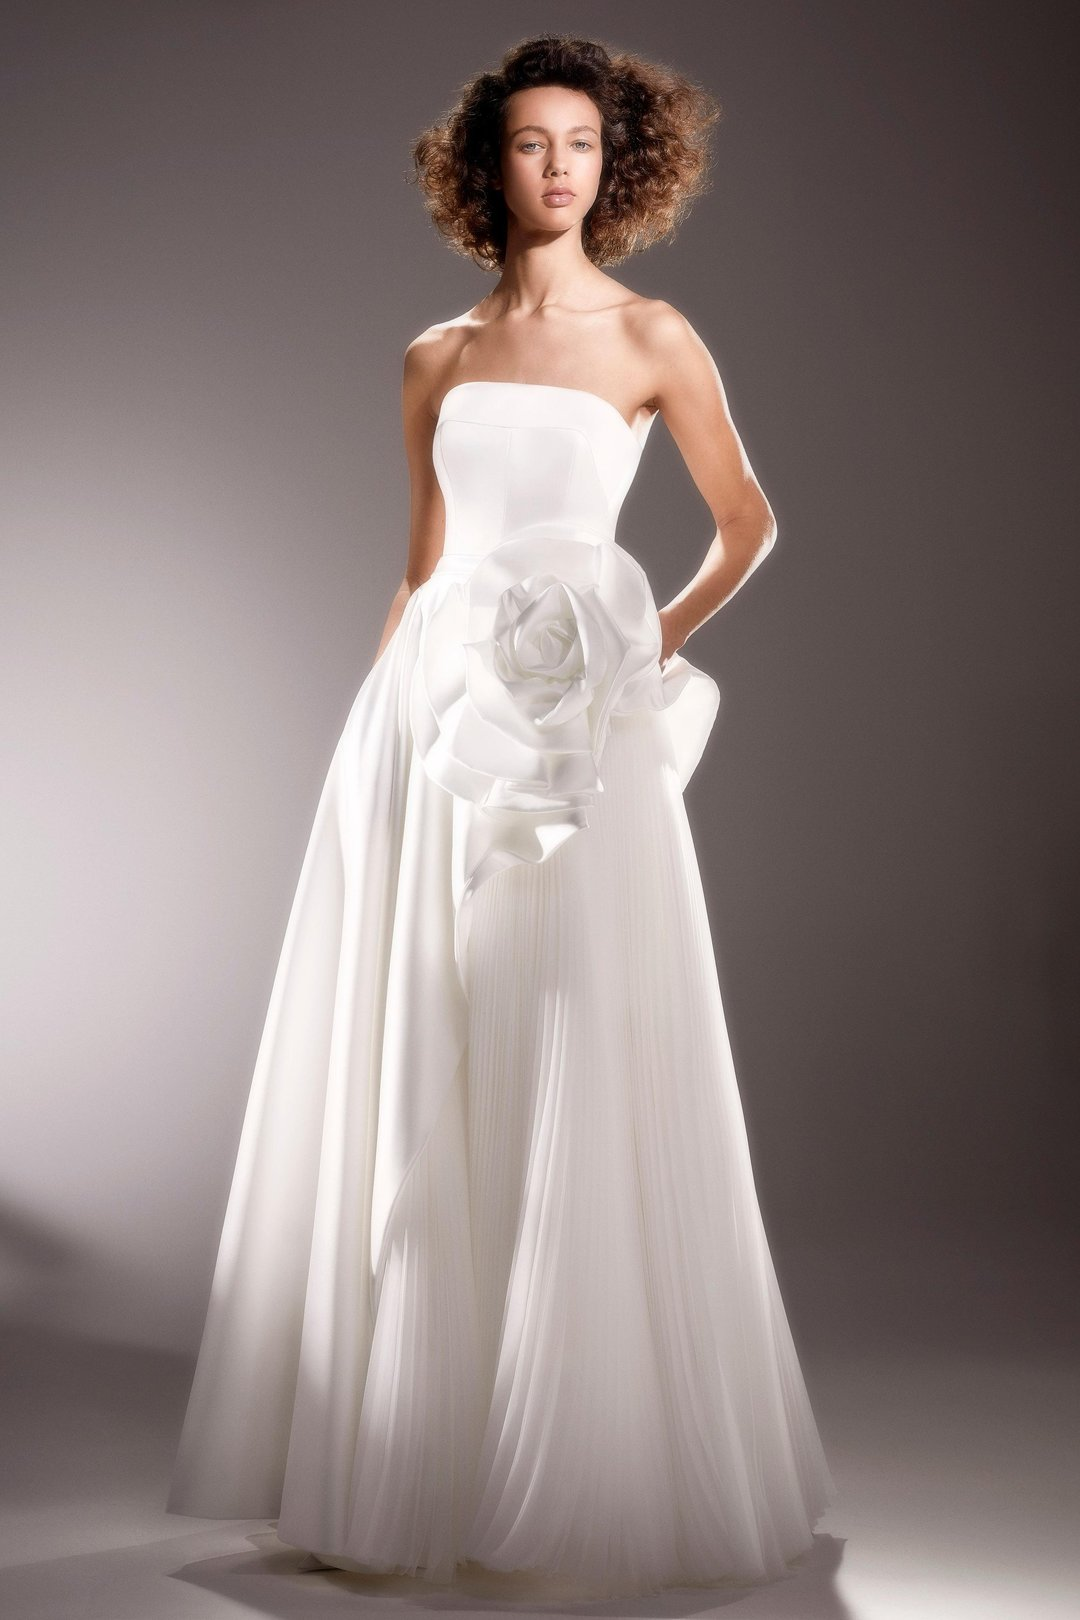 draped rose diagonal cut gown dress photo